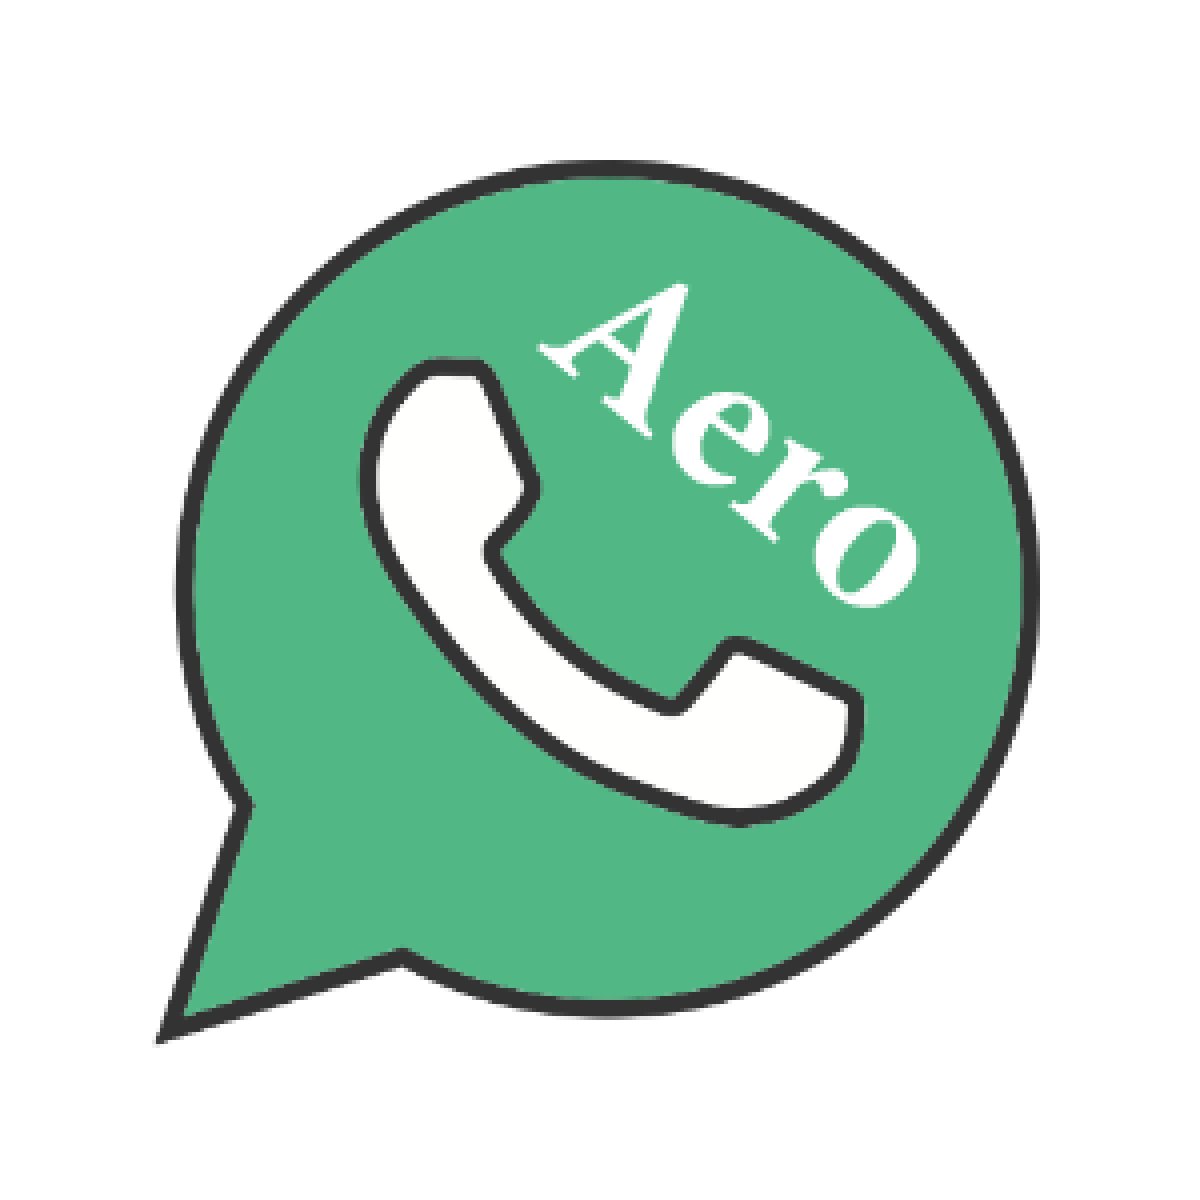 WhatsApp Aero icon